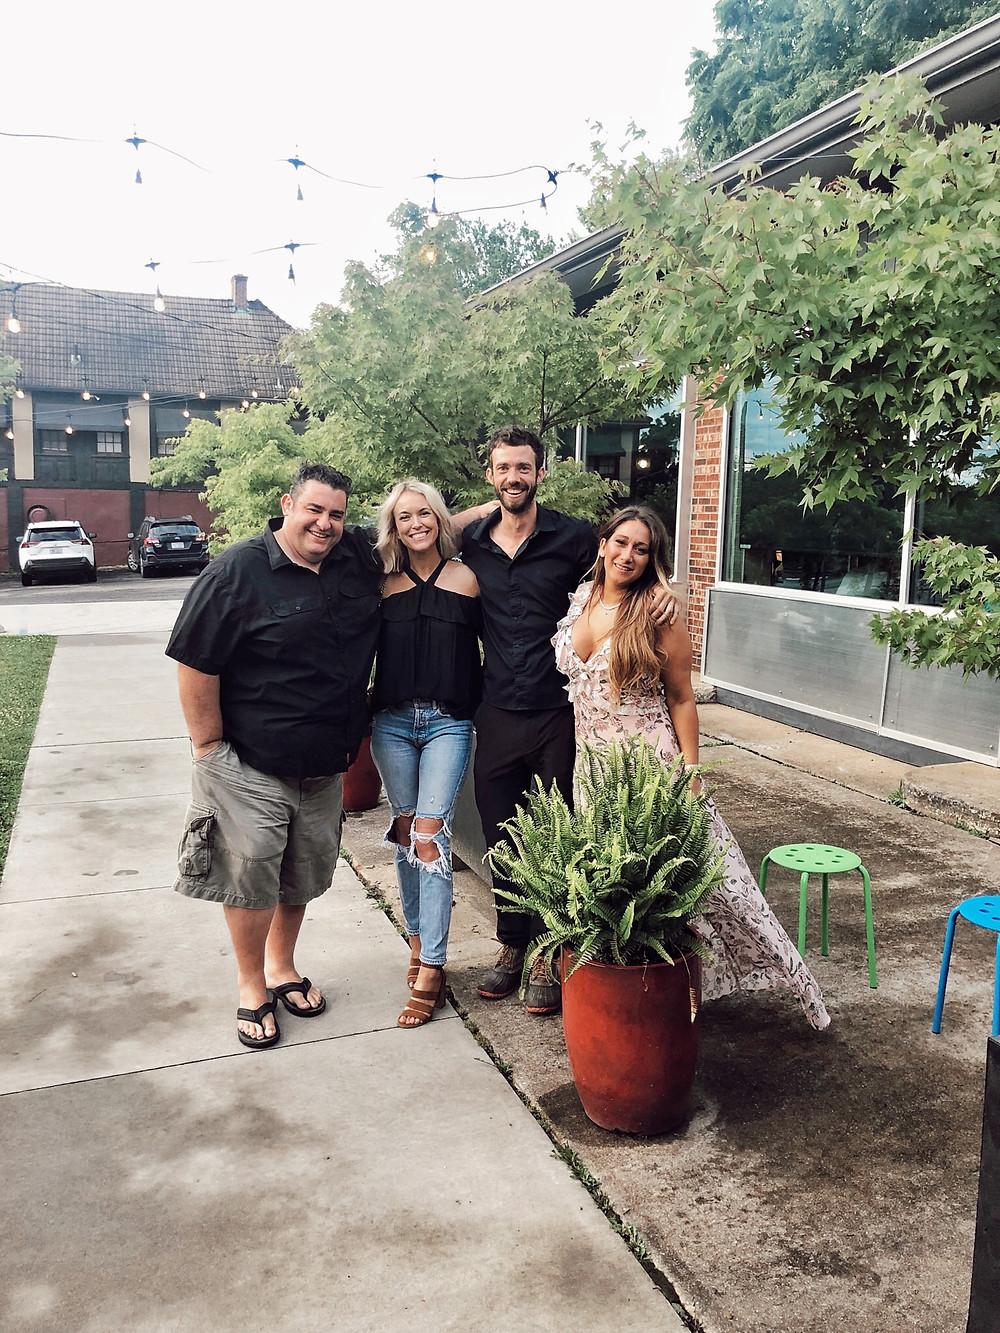 Gan Shan Station, Asheville restaurant, Asian food and fare, Visit Asheville, local favorite, food bloggers